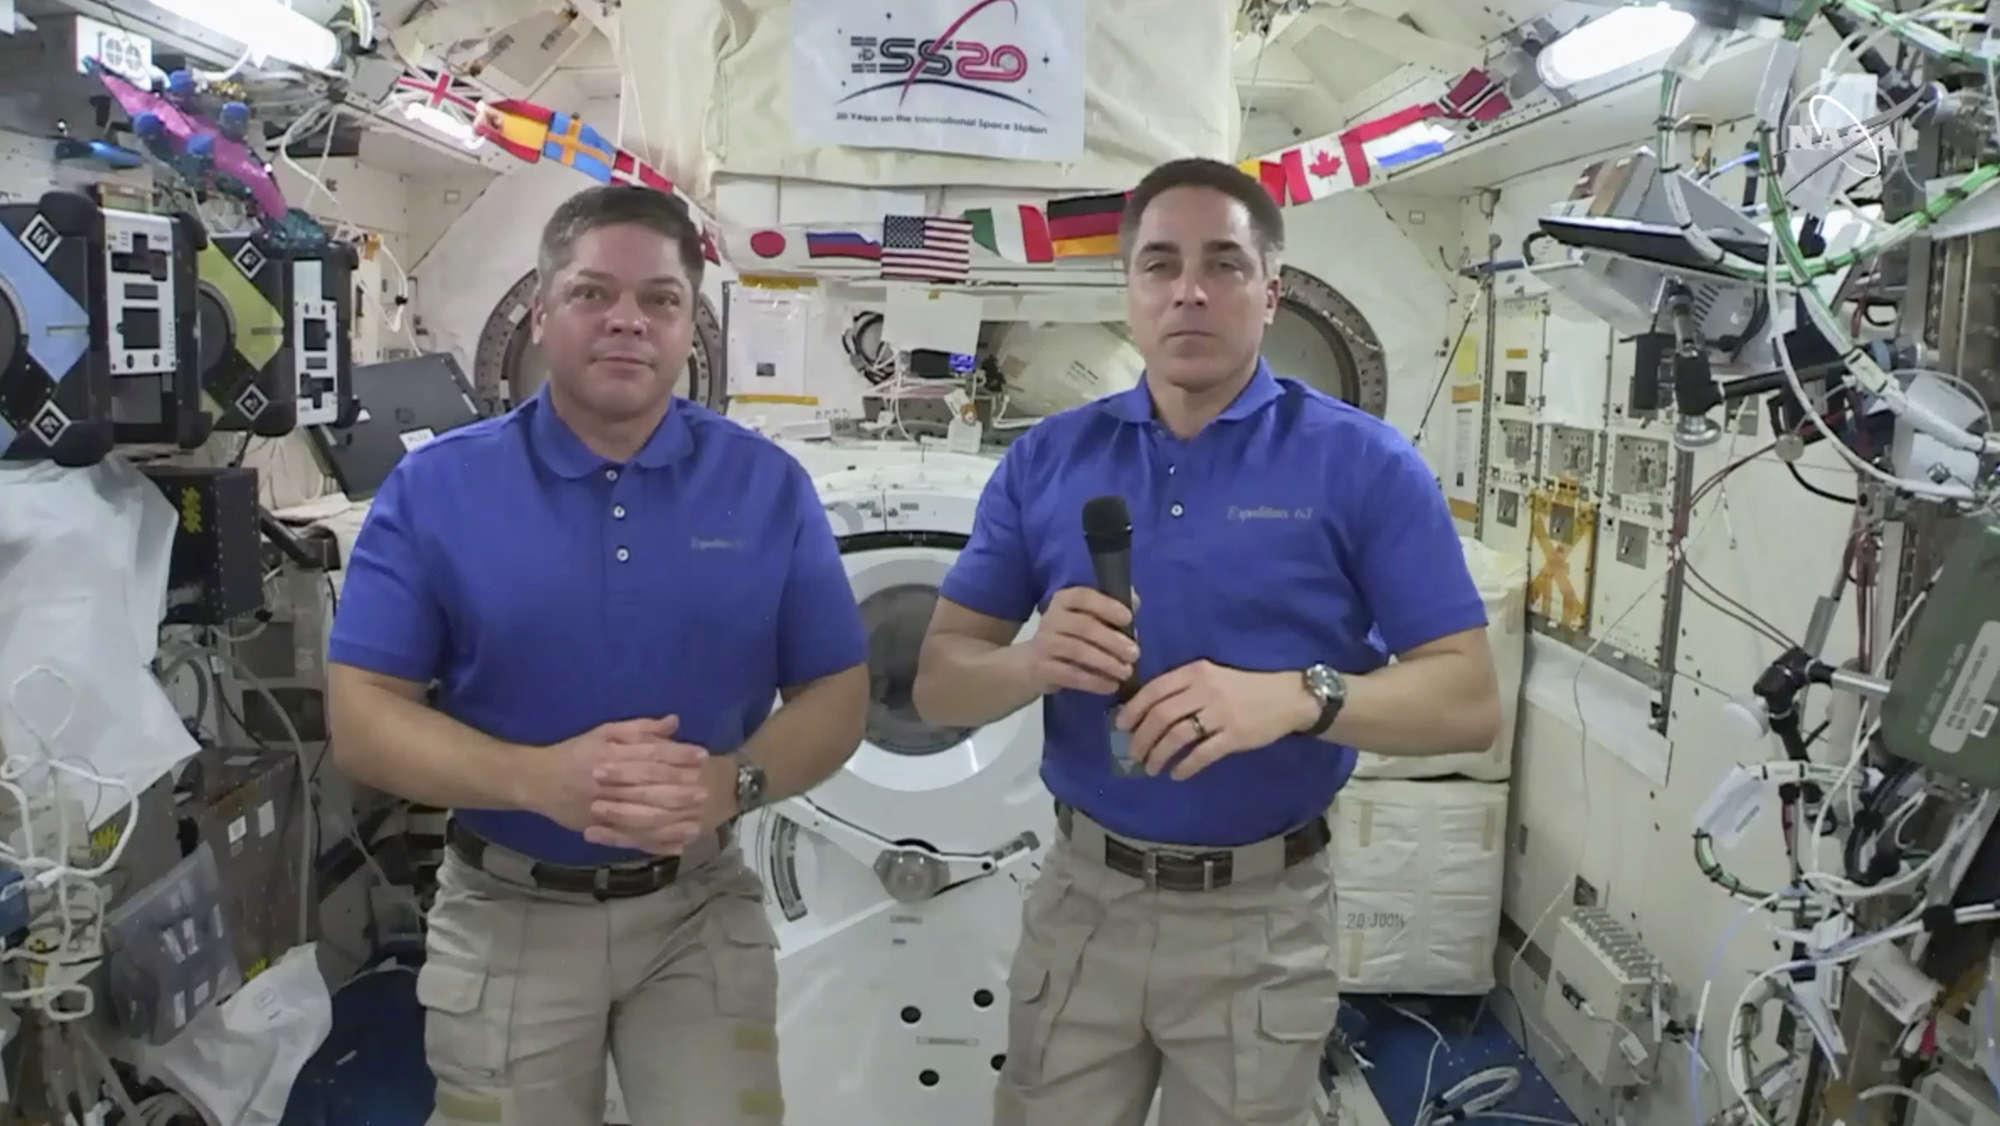 NASA astronaut Chris Cassidy, right answers a question as fellow astronaut Robert L. Behnken listens during an interview aboard the International Space Station